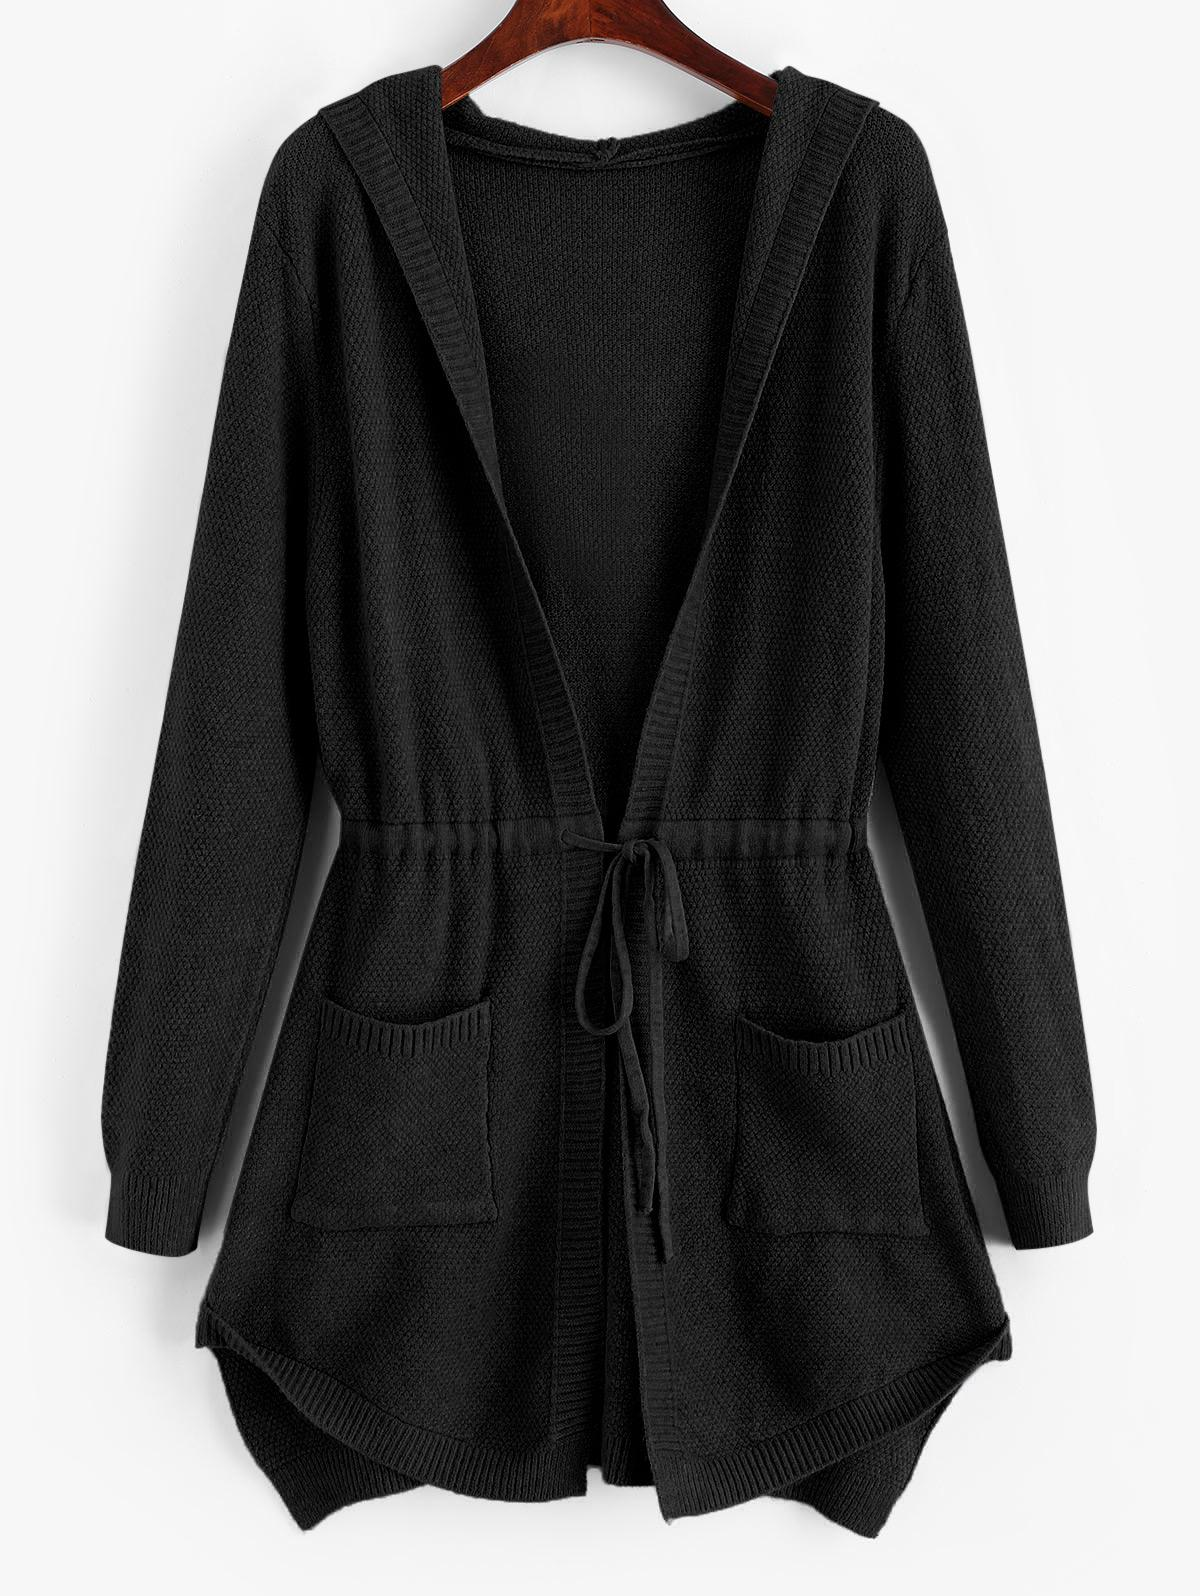 Longline Hooded Drawstring Pockets Cardigan